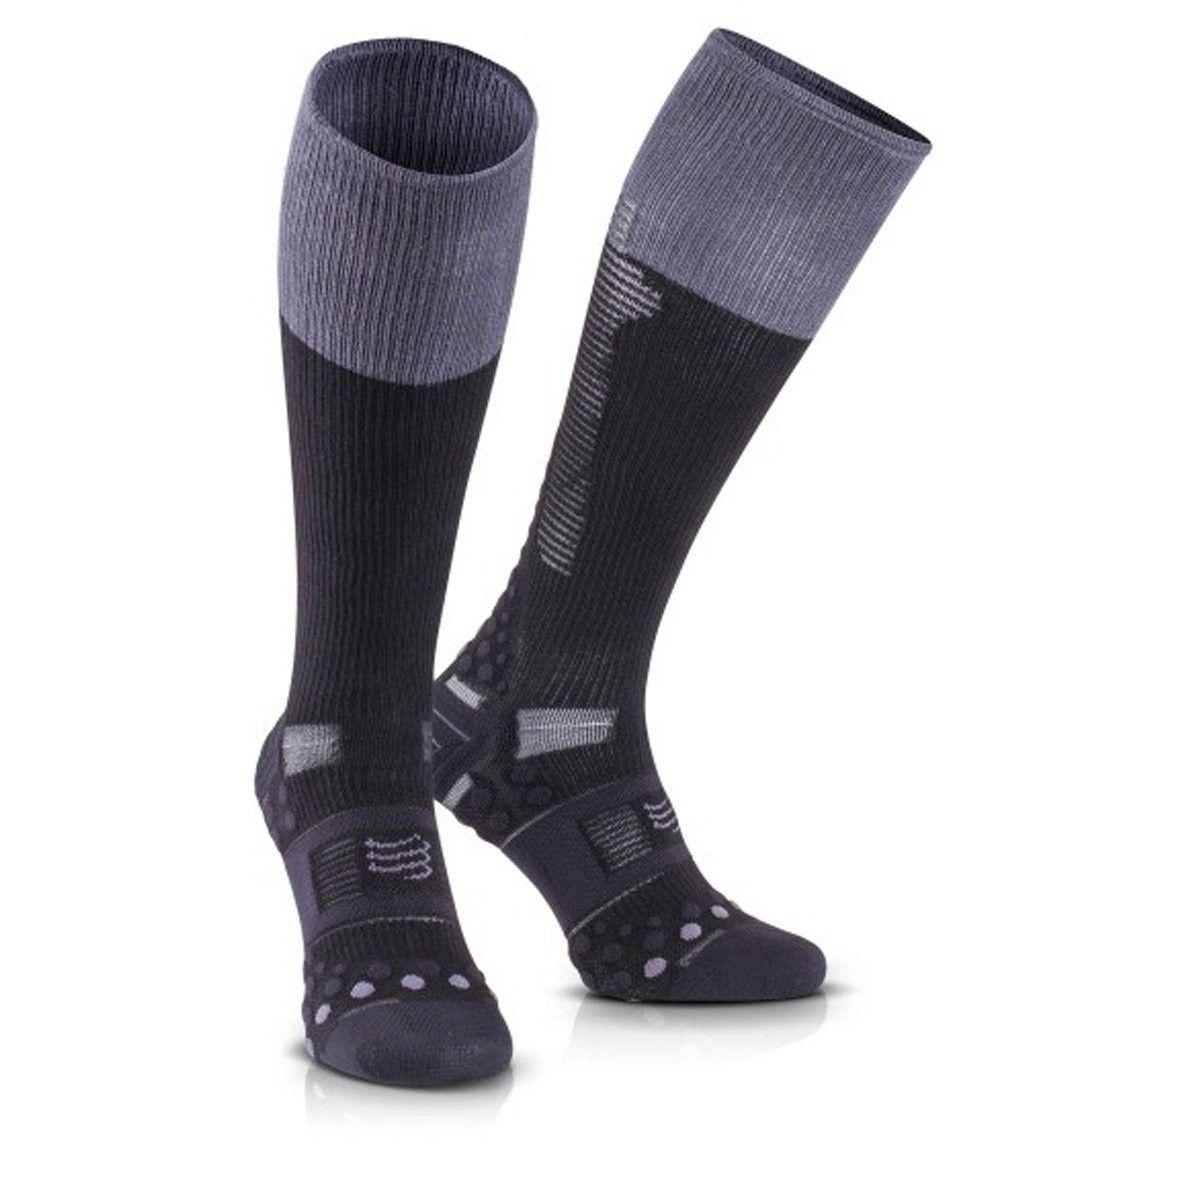 Ironman 2017 Full Detox Recovery Compression Socks FSD